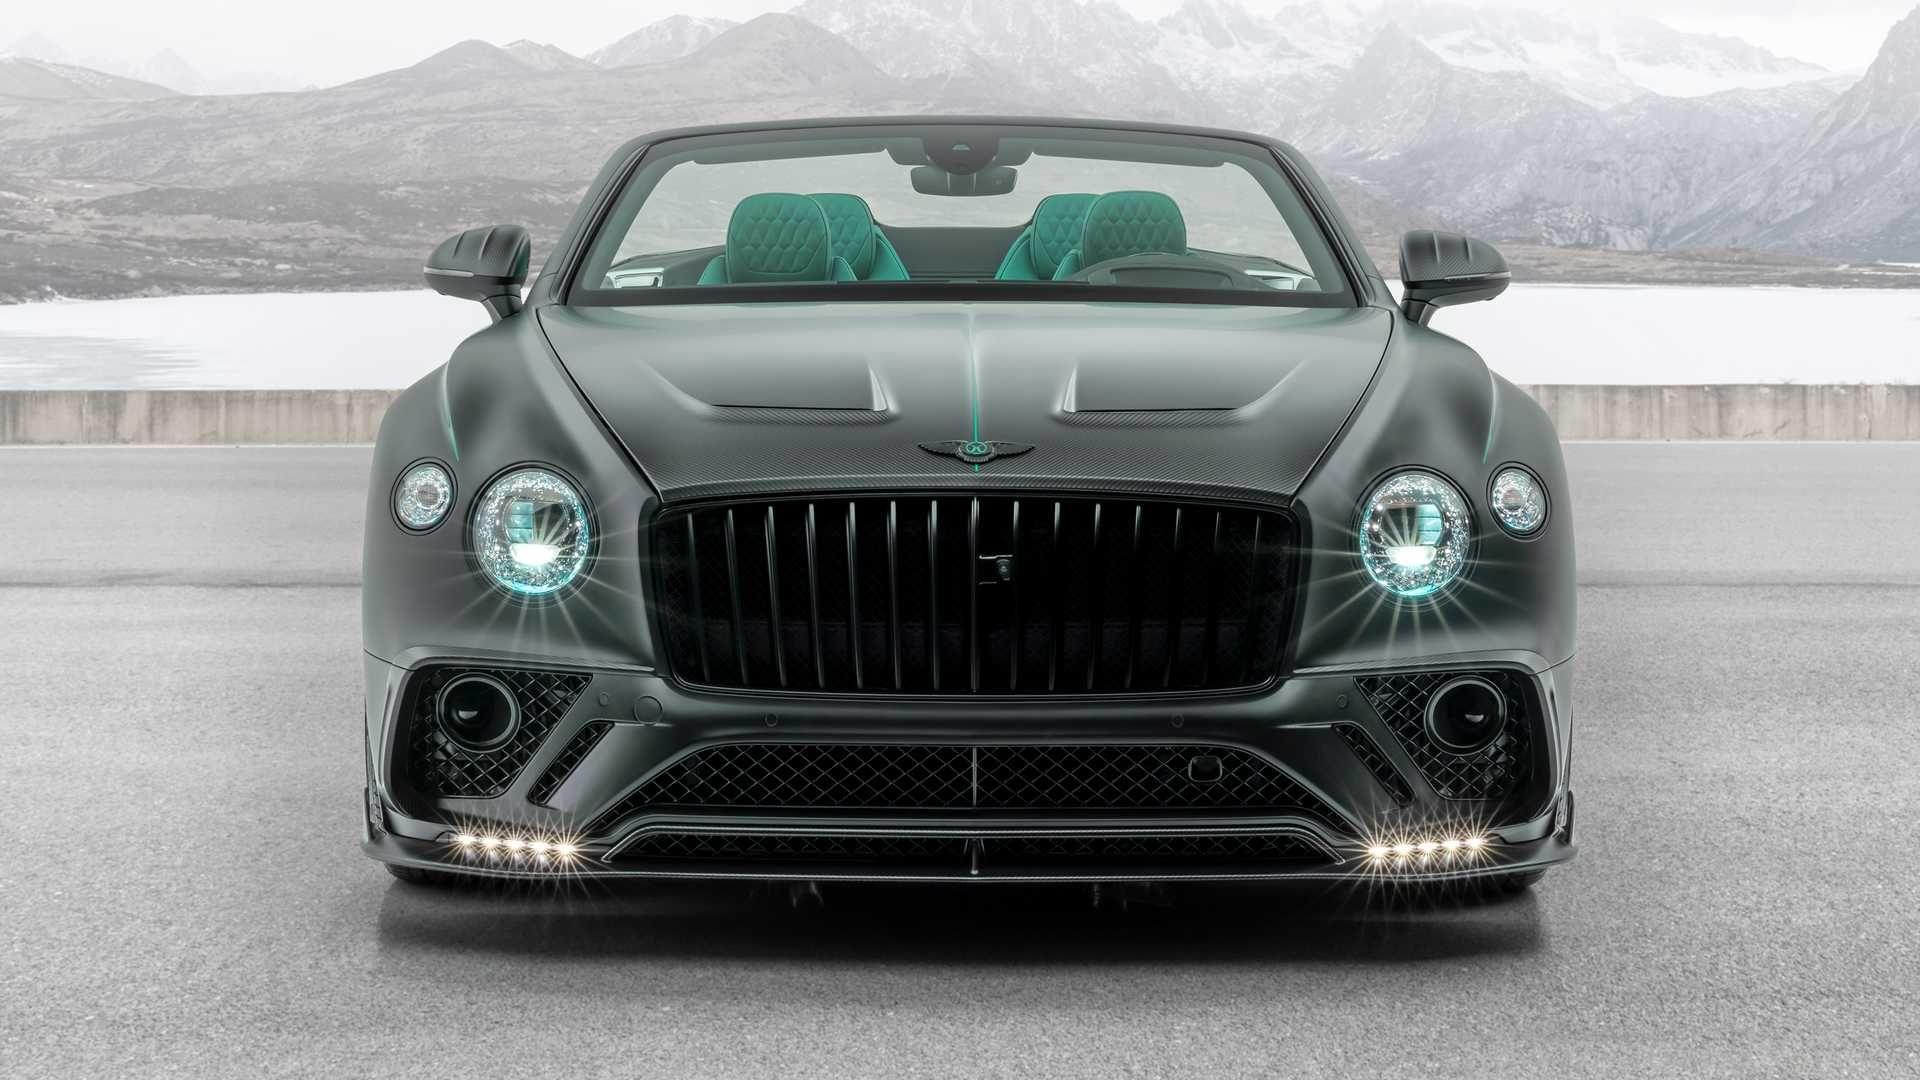 Bentley-Continental-GTC-V8-Cabriolet-Mansory-4